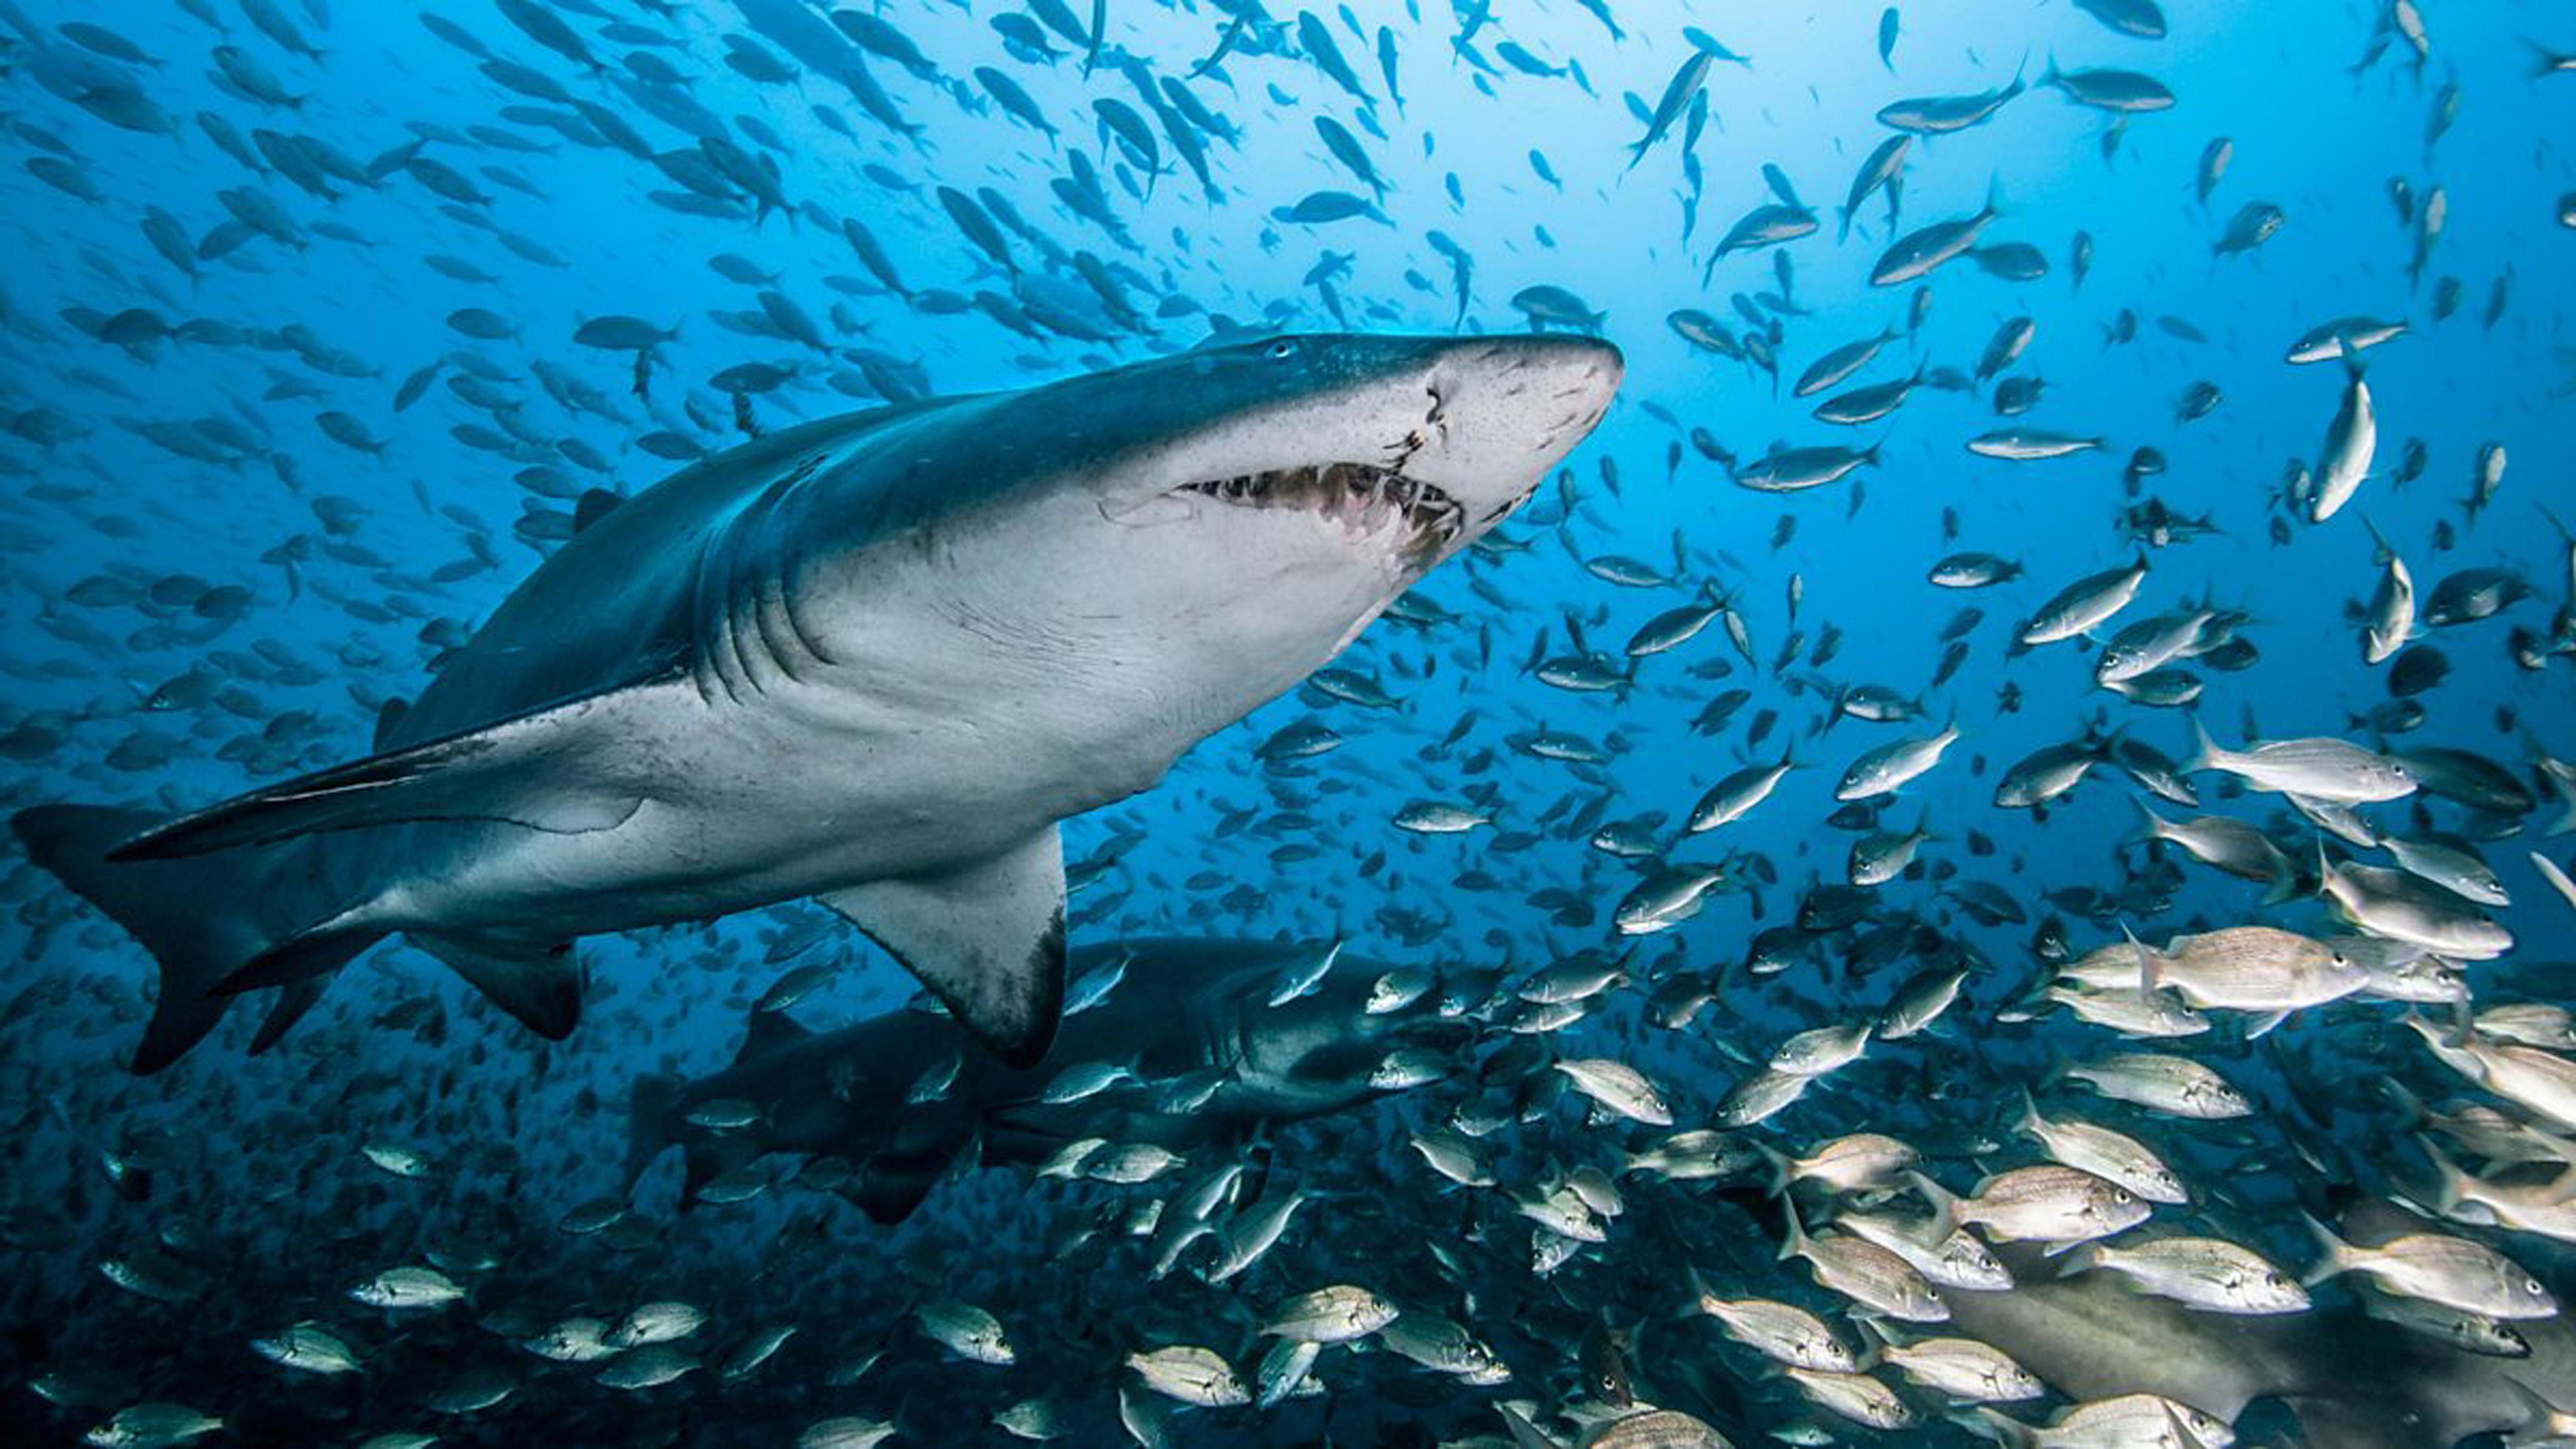 Flowers Wallpapers For Desktop Full Size Hd Ocean Underwater World Shark Fish Water Beautiful Hd